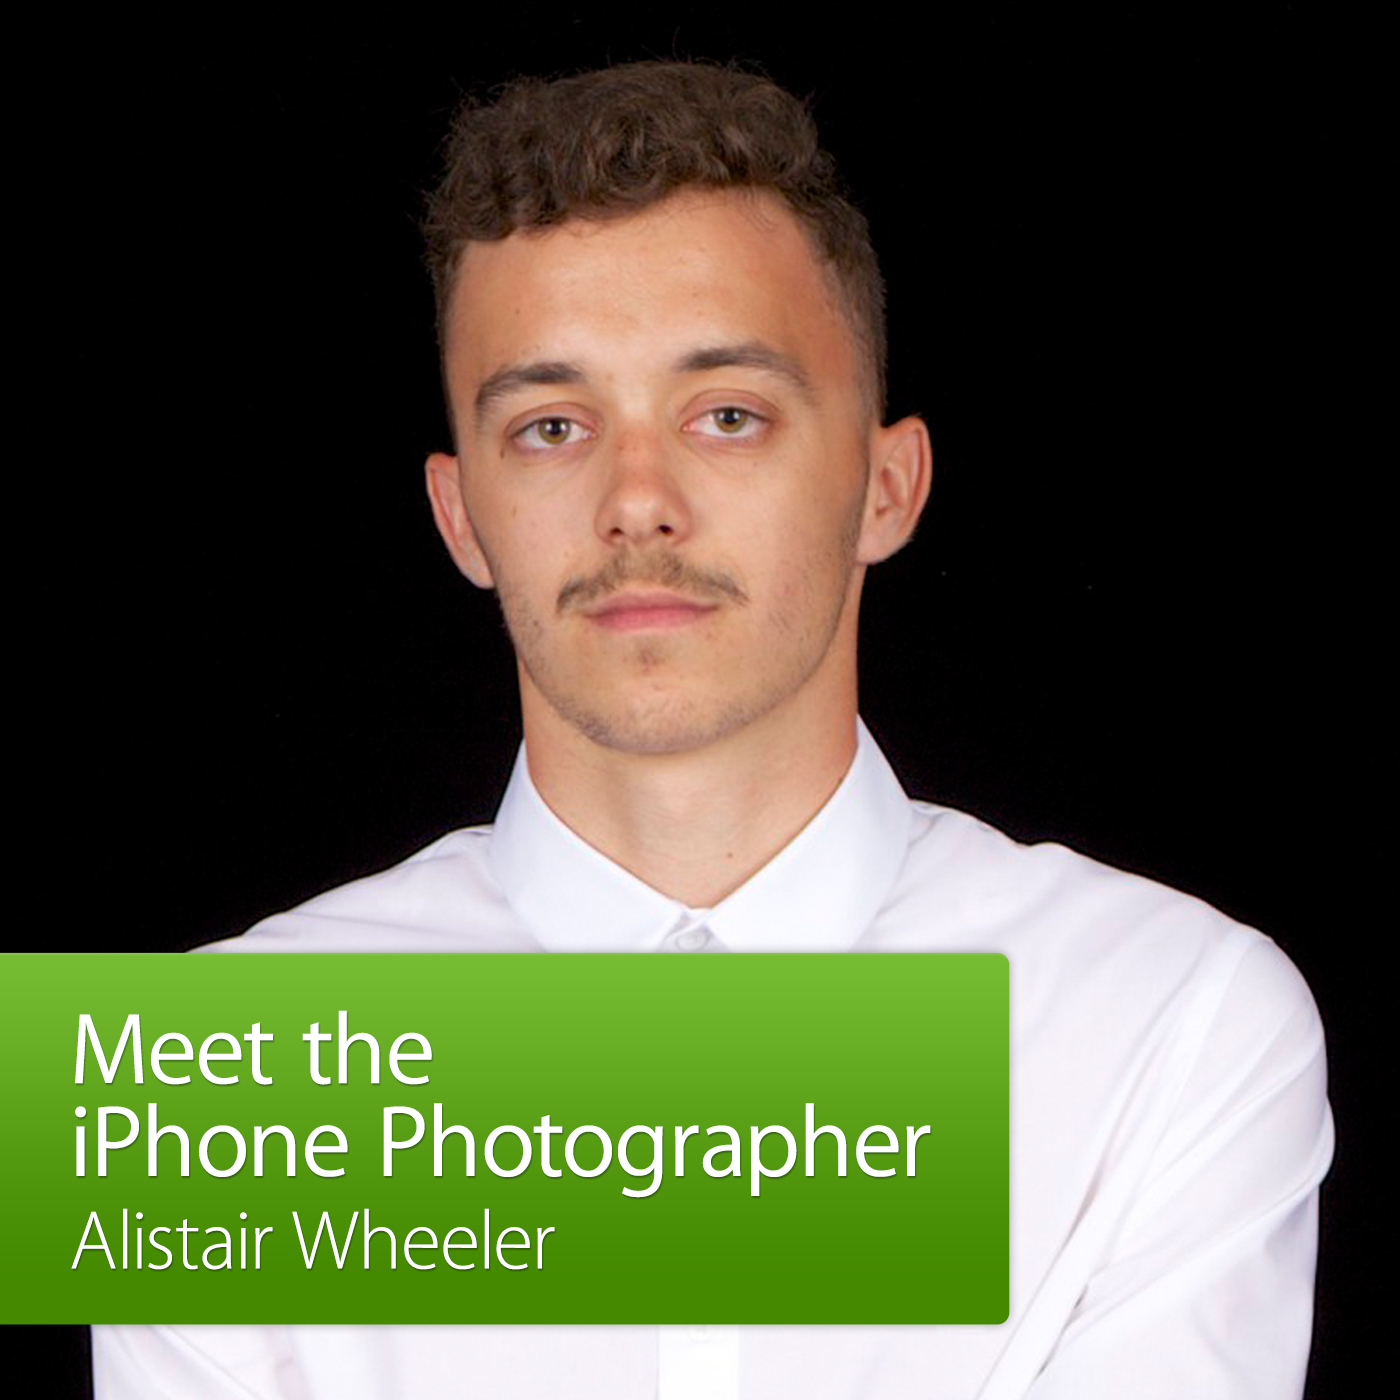 Alistair Wheeler: Meet the iPhone Photographer